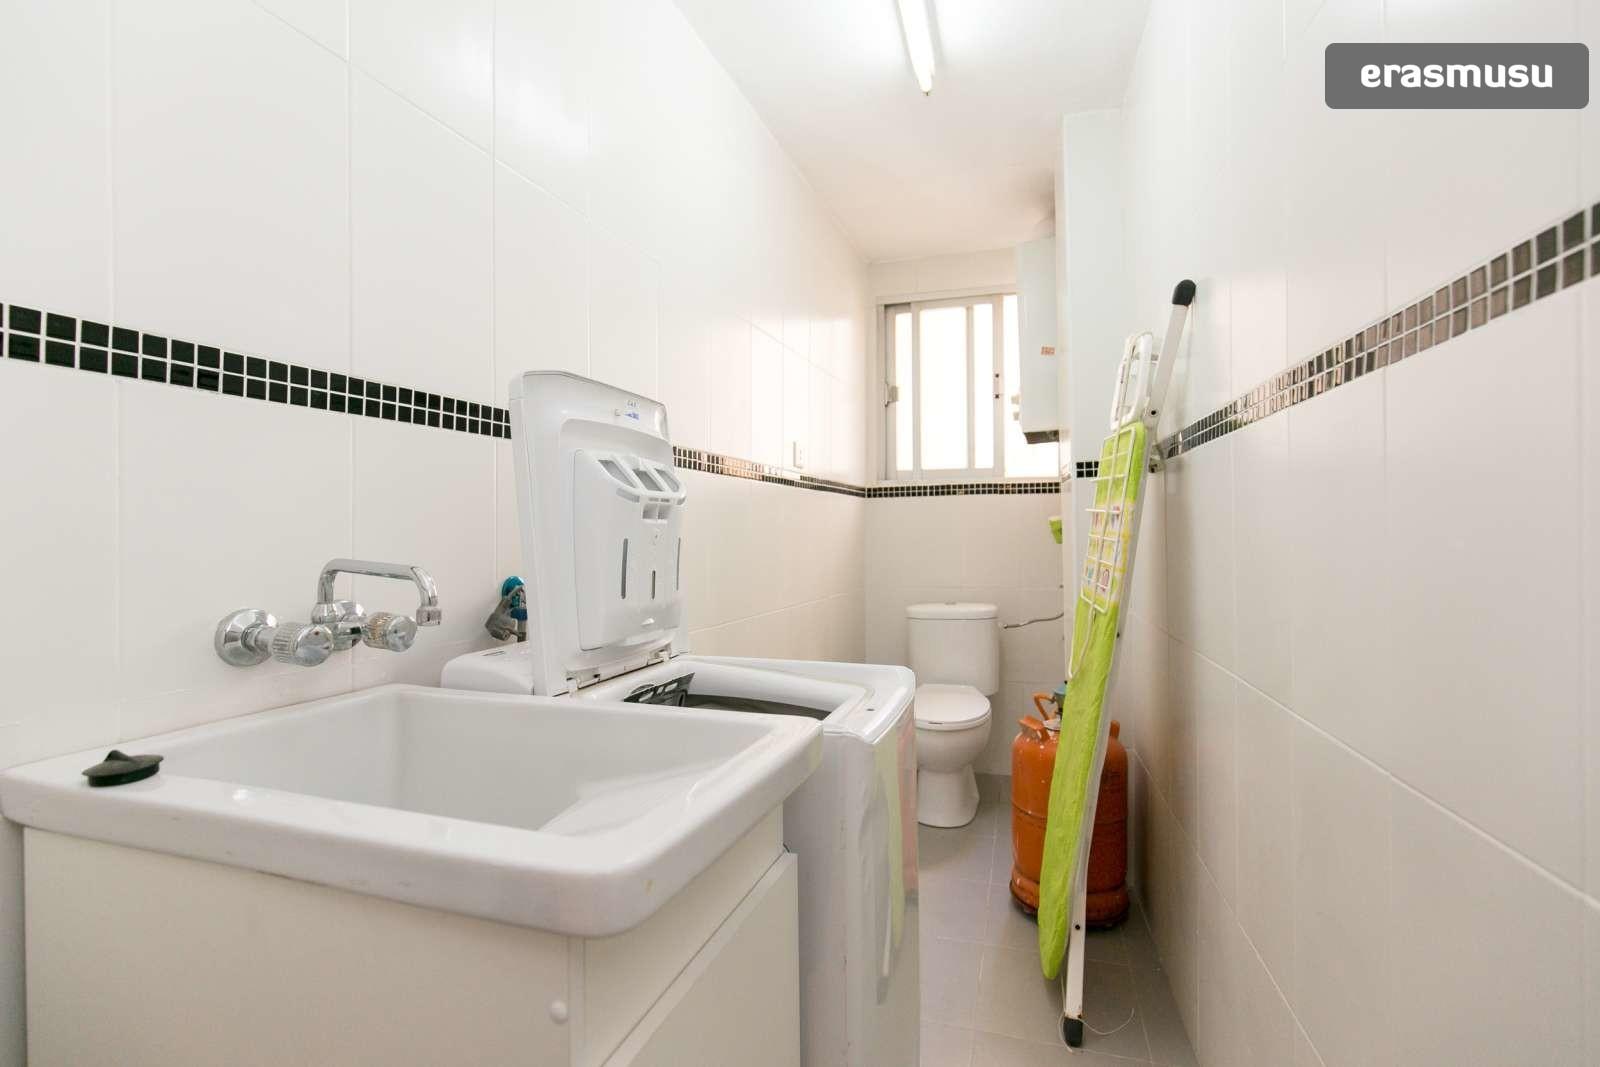 spacious-3-bedroom-apartment-rent-realejo-cefc33fd5a8c103ab645e7